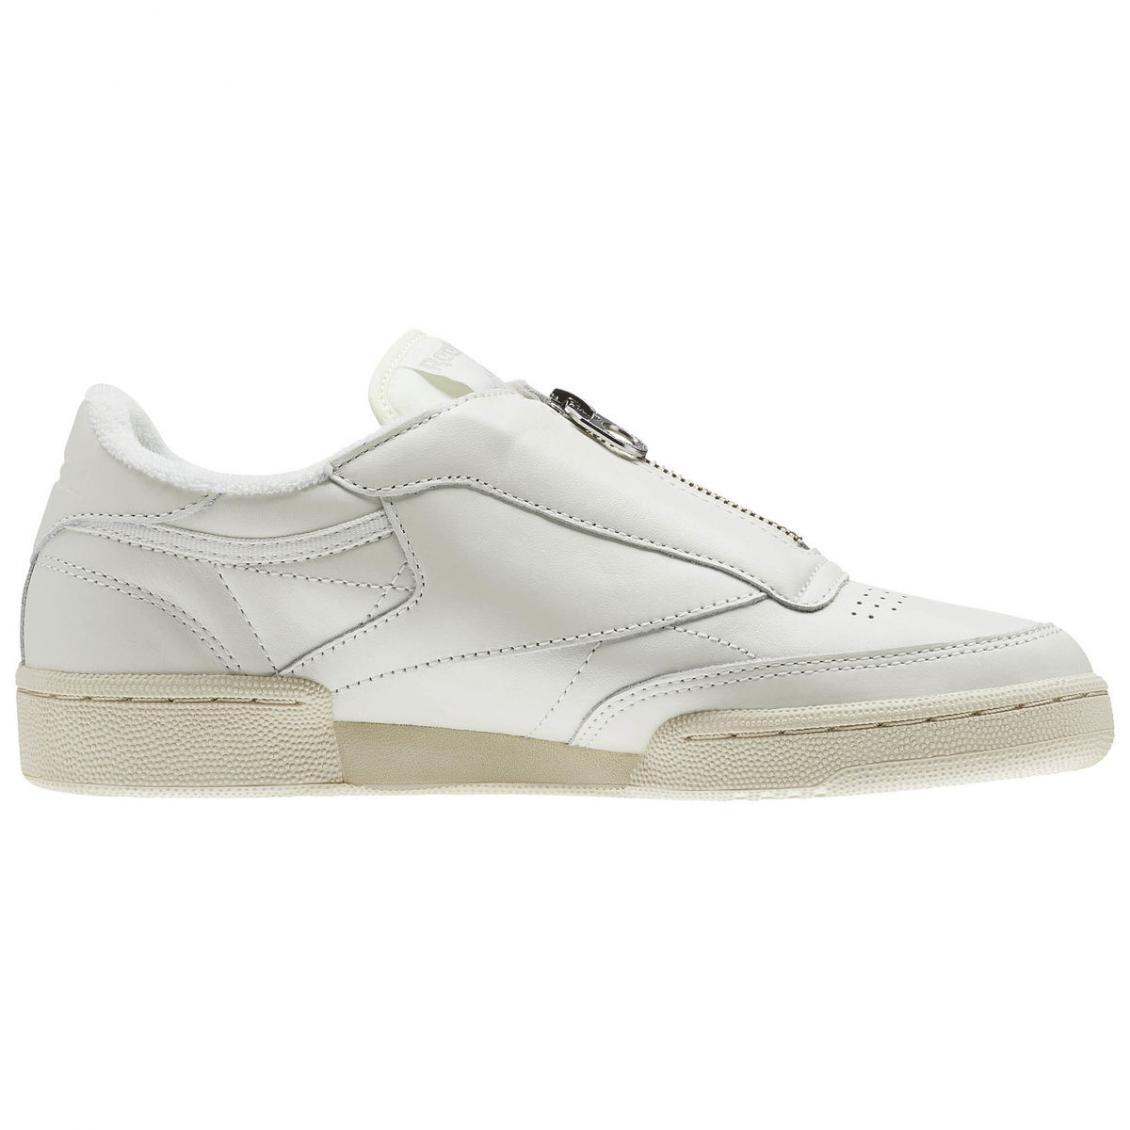 White – Reebok Club C 85 Zip Womens Chalk / Sand Stone / Paper White / Met Silver